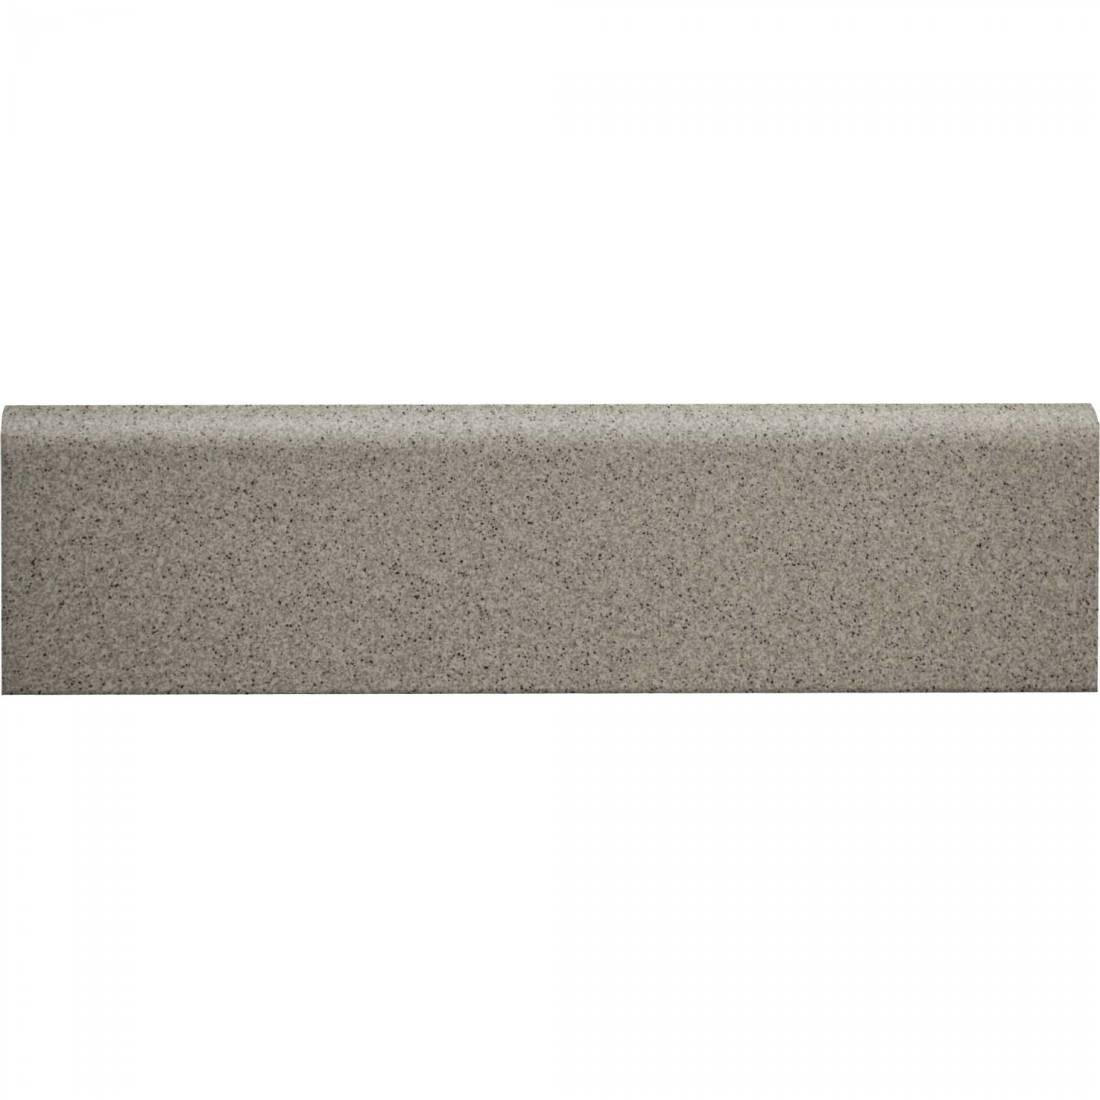 Granit Skirt Plinth 30x8 Nordic Light Grey Matt 1